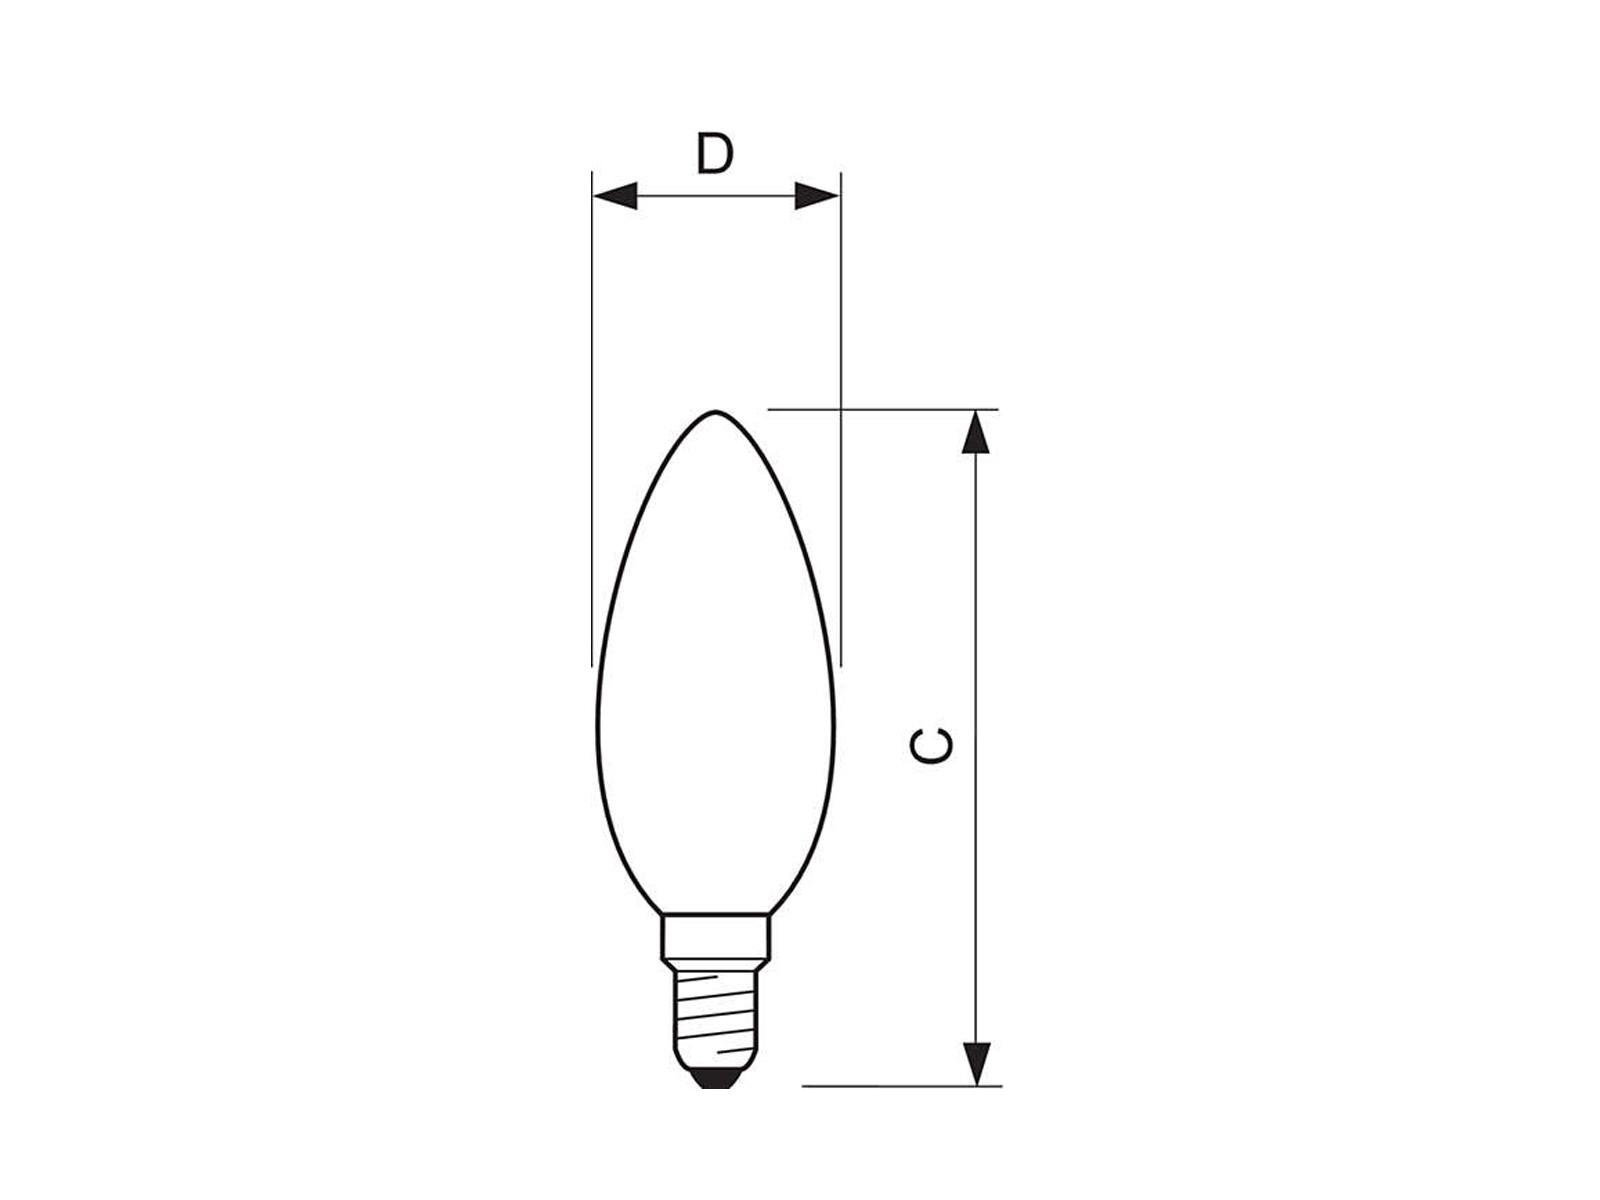 70-5176-E14-Skizze-1600x1200 Erstaunlich Philips Led Leuchtmittel E14 Dekorationen